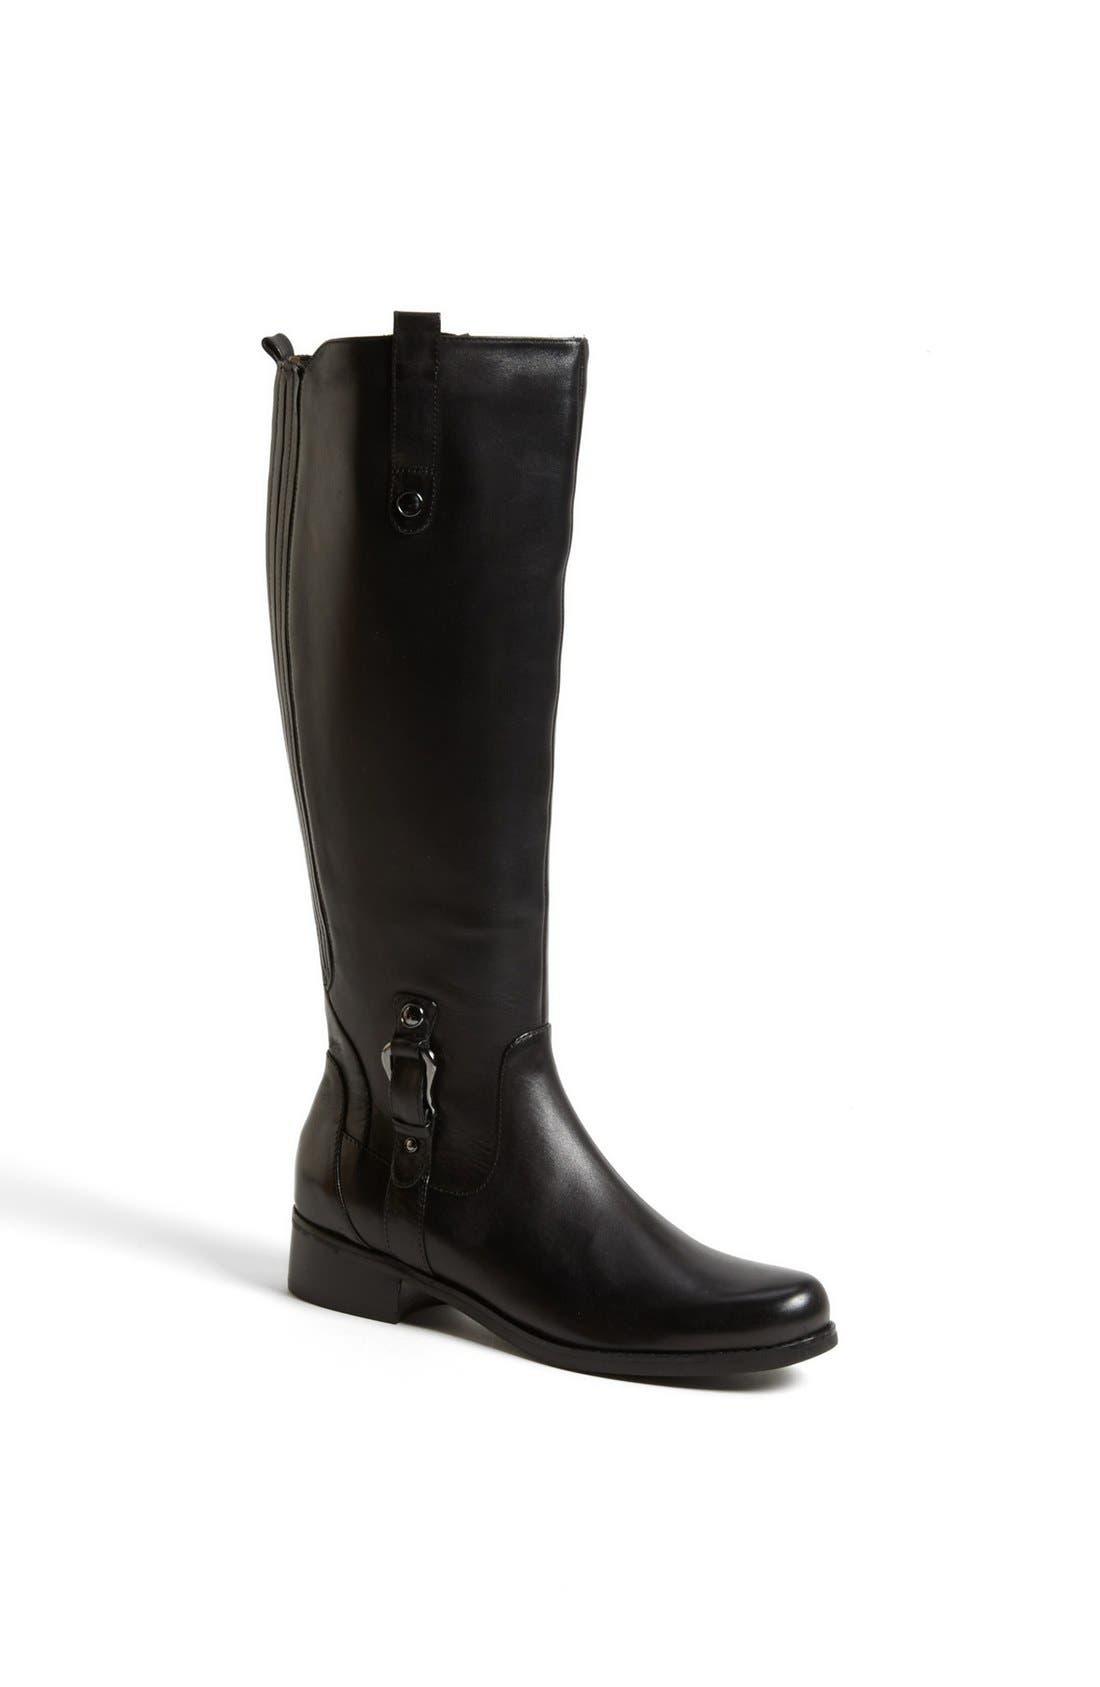 Blondo 'Venise' Waterproof Leather Riding Boot (Women)